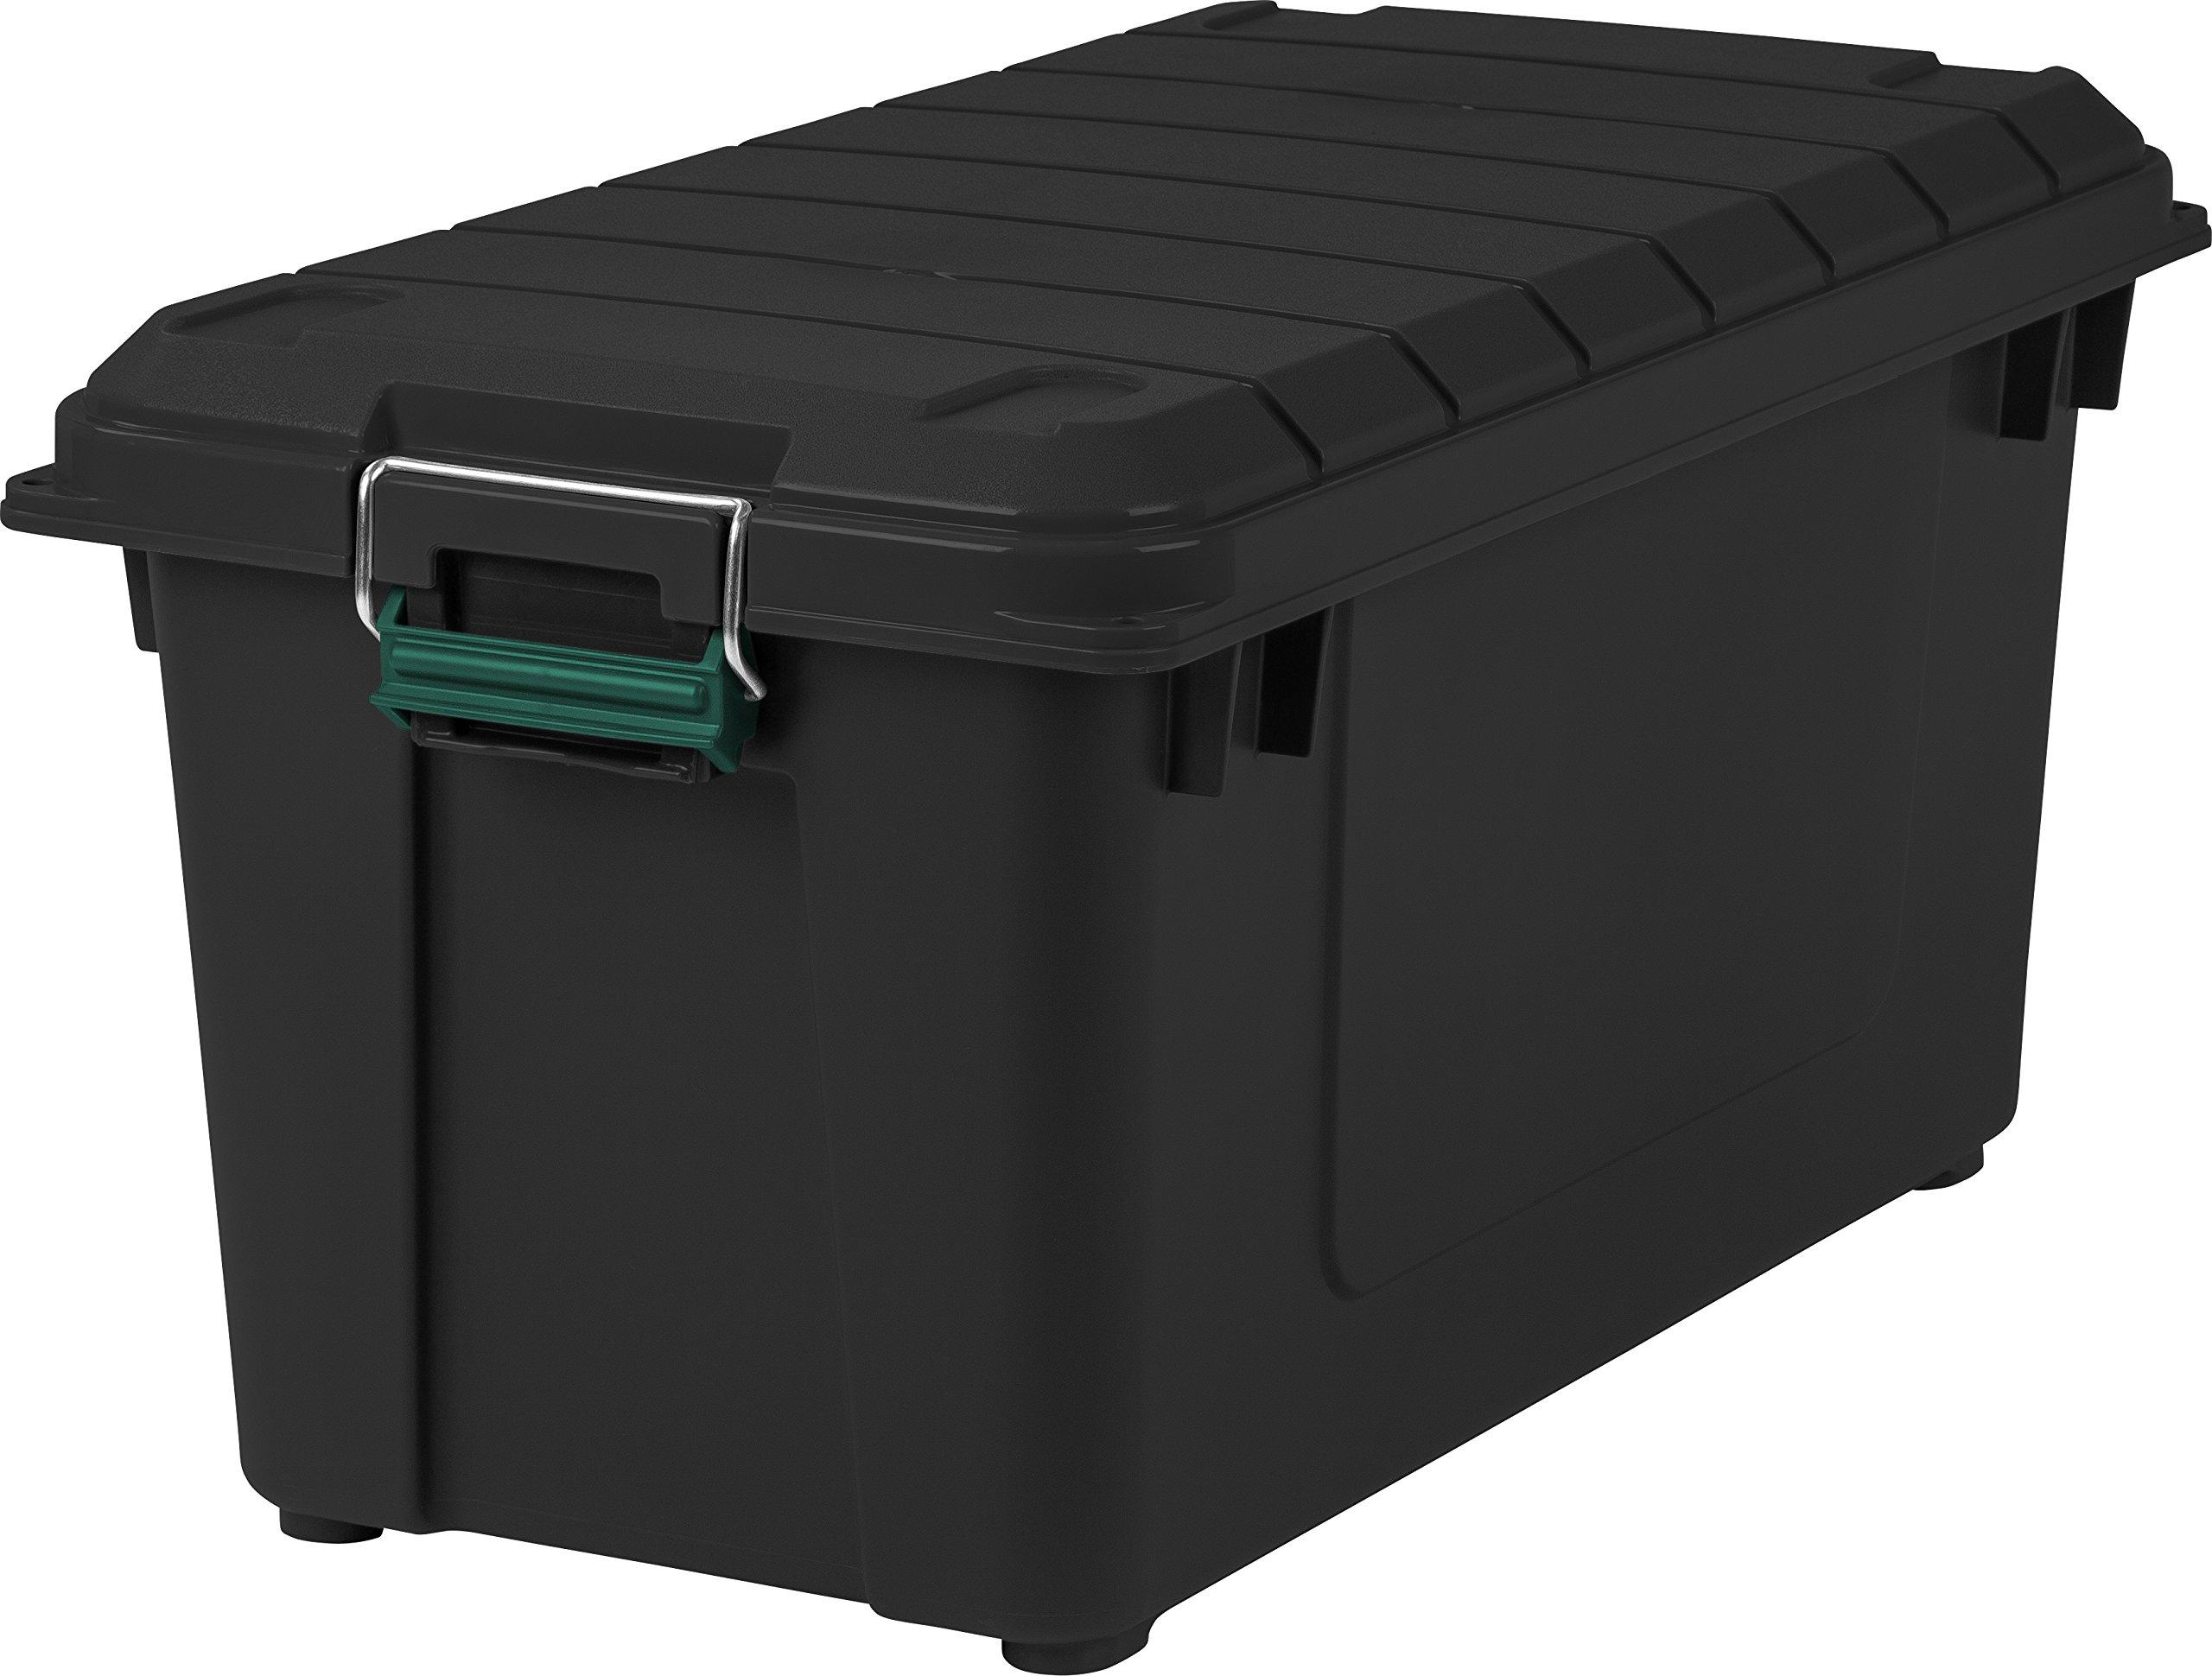 IRIS USA, Inc. Remington 82 Quart WEATHERTIGHT Storage Box, Store-It-All Utility Tote, Black by IRIS USA, Inc.